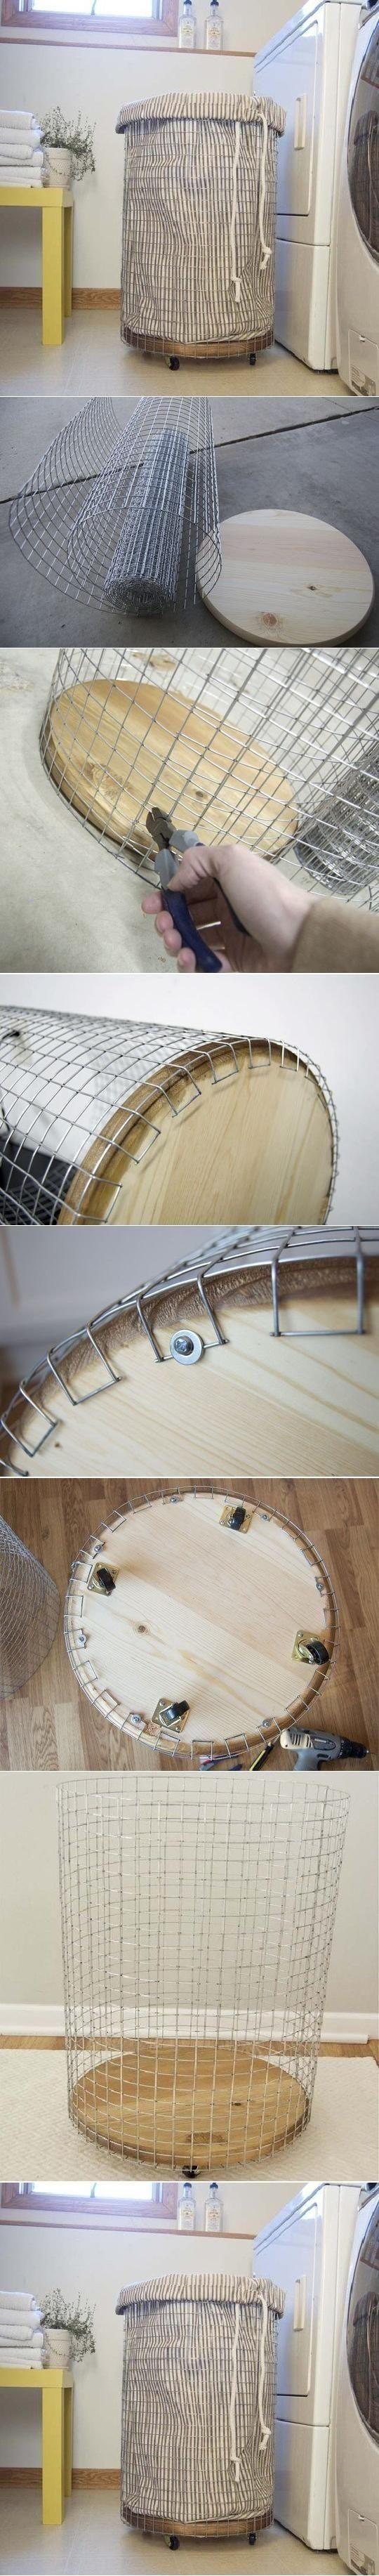 DIY Easy Laundry Basket by SAburns